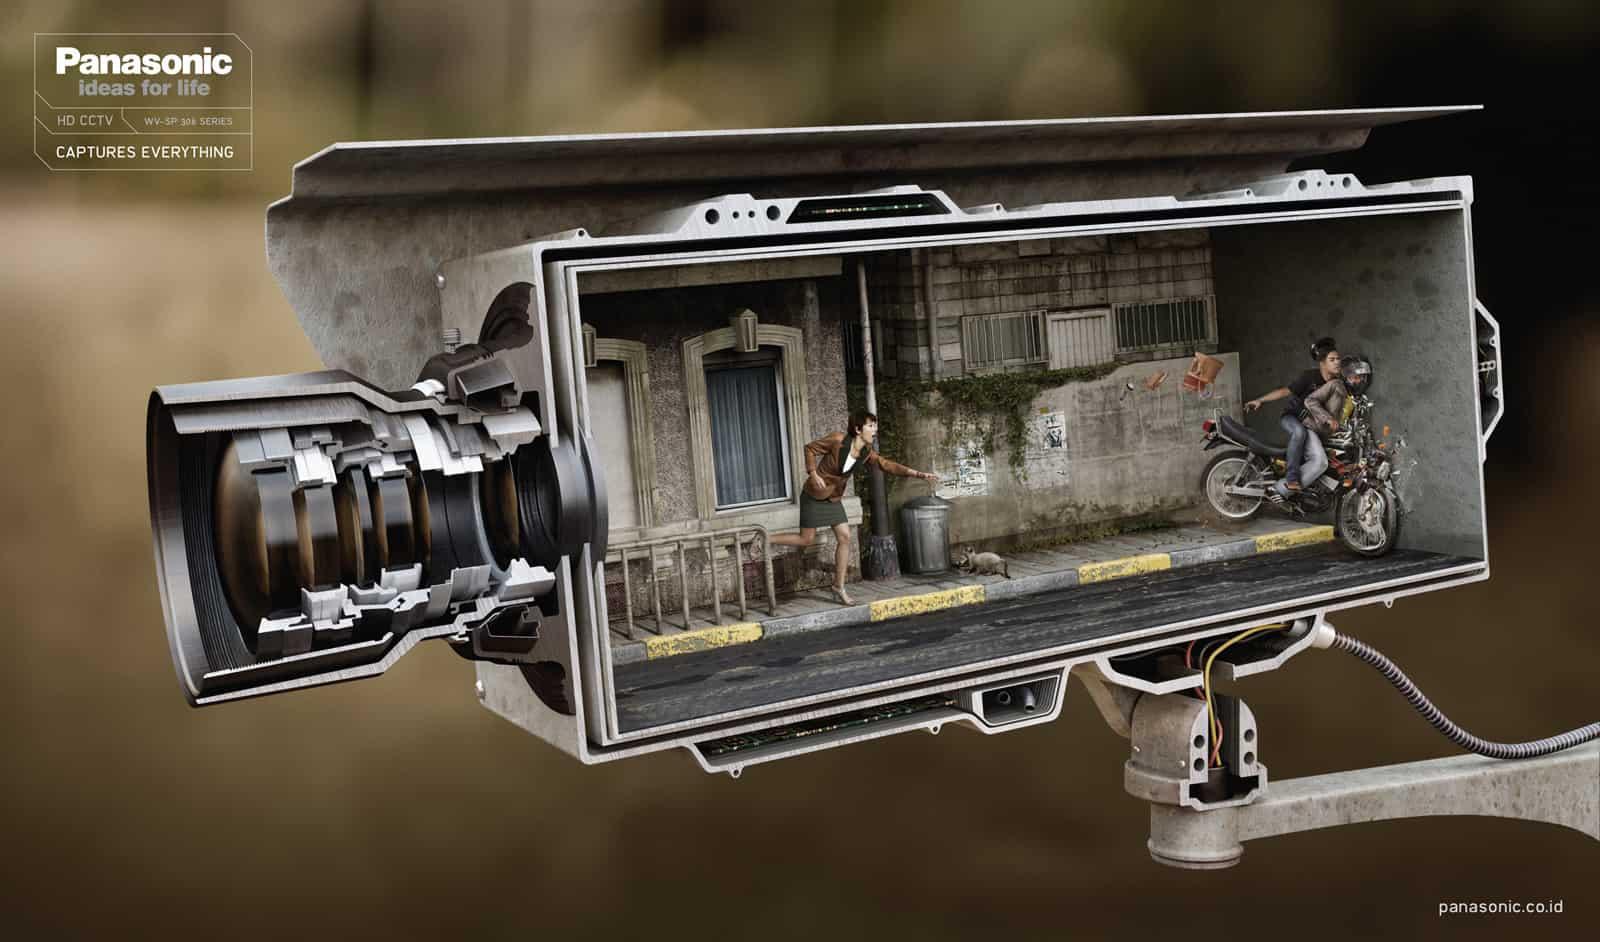 Pub Panasonic HD CCTV : voleurs